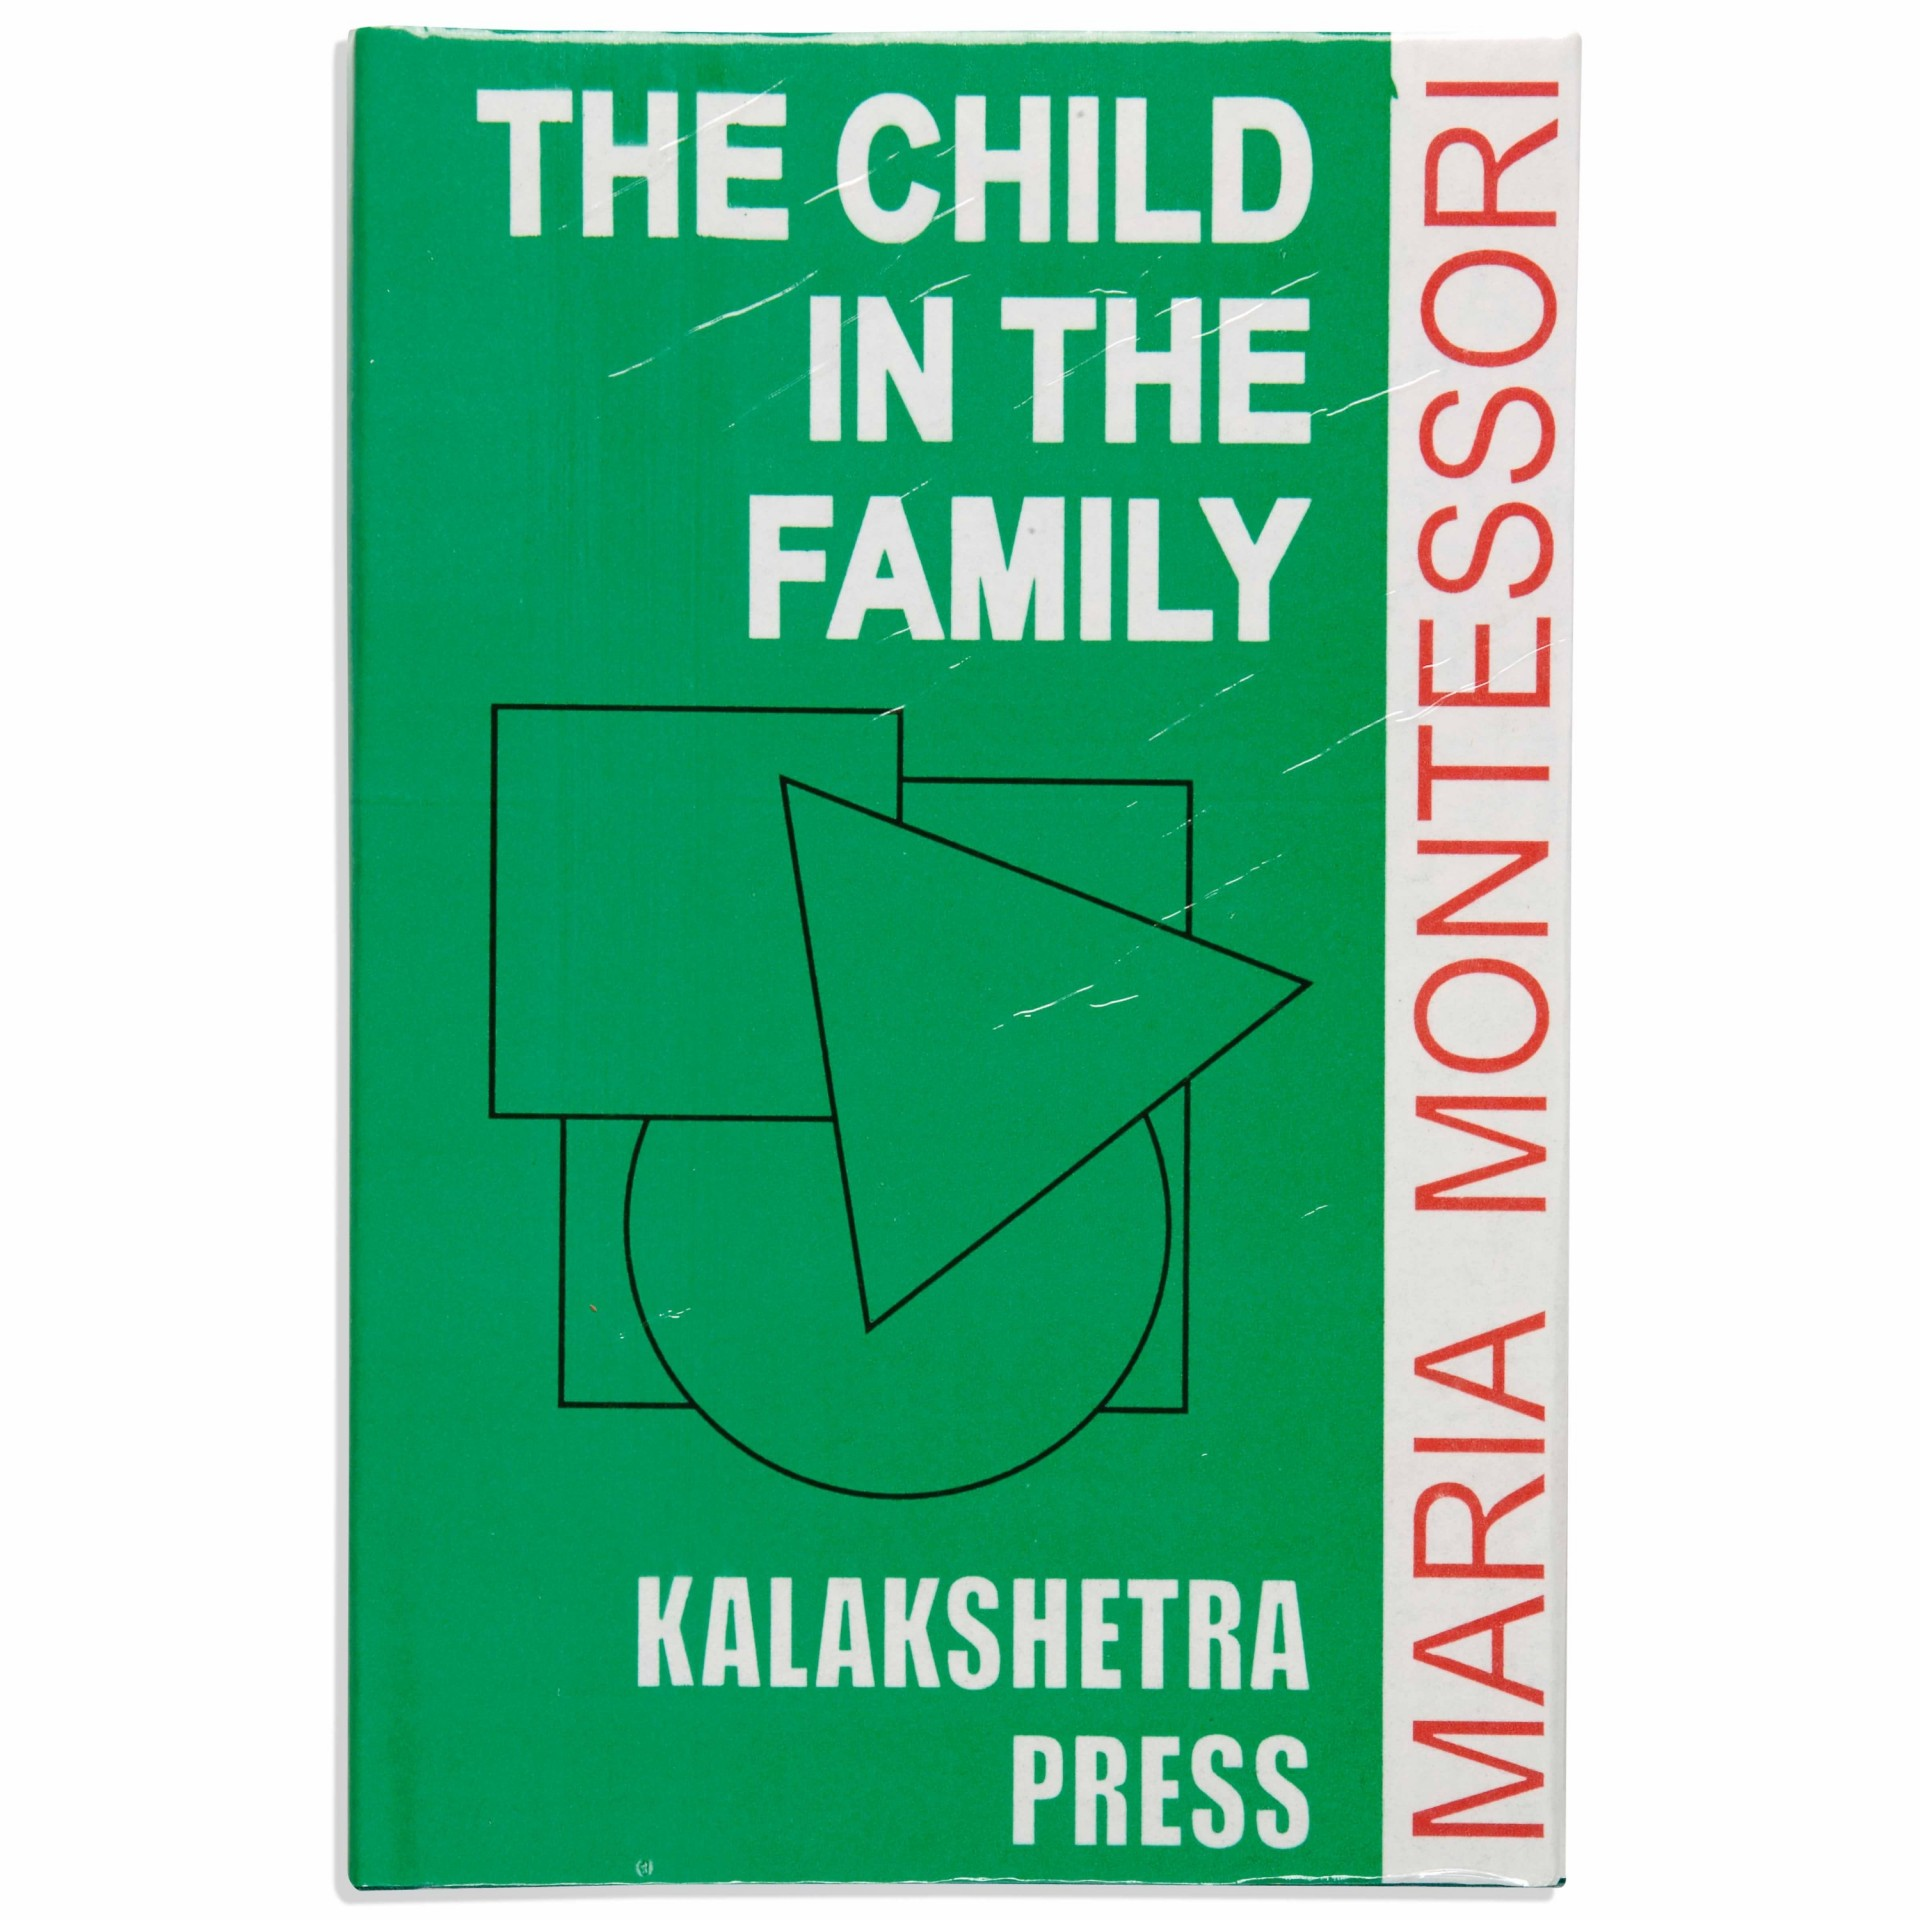 The Child in the Family (Kalakshetra Press Edition) _ Maria Montessori